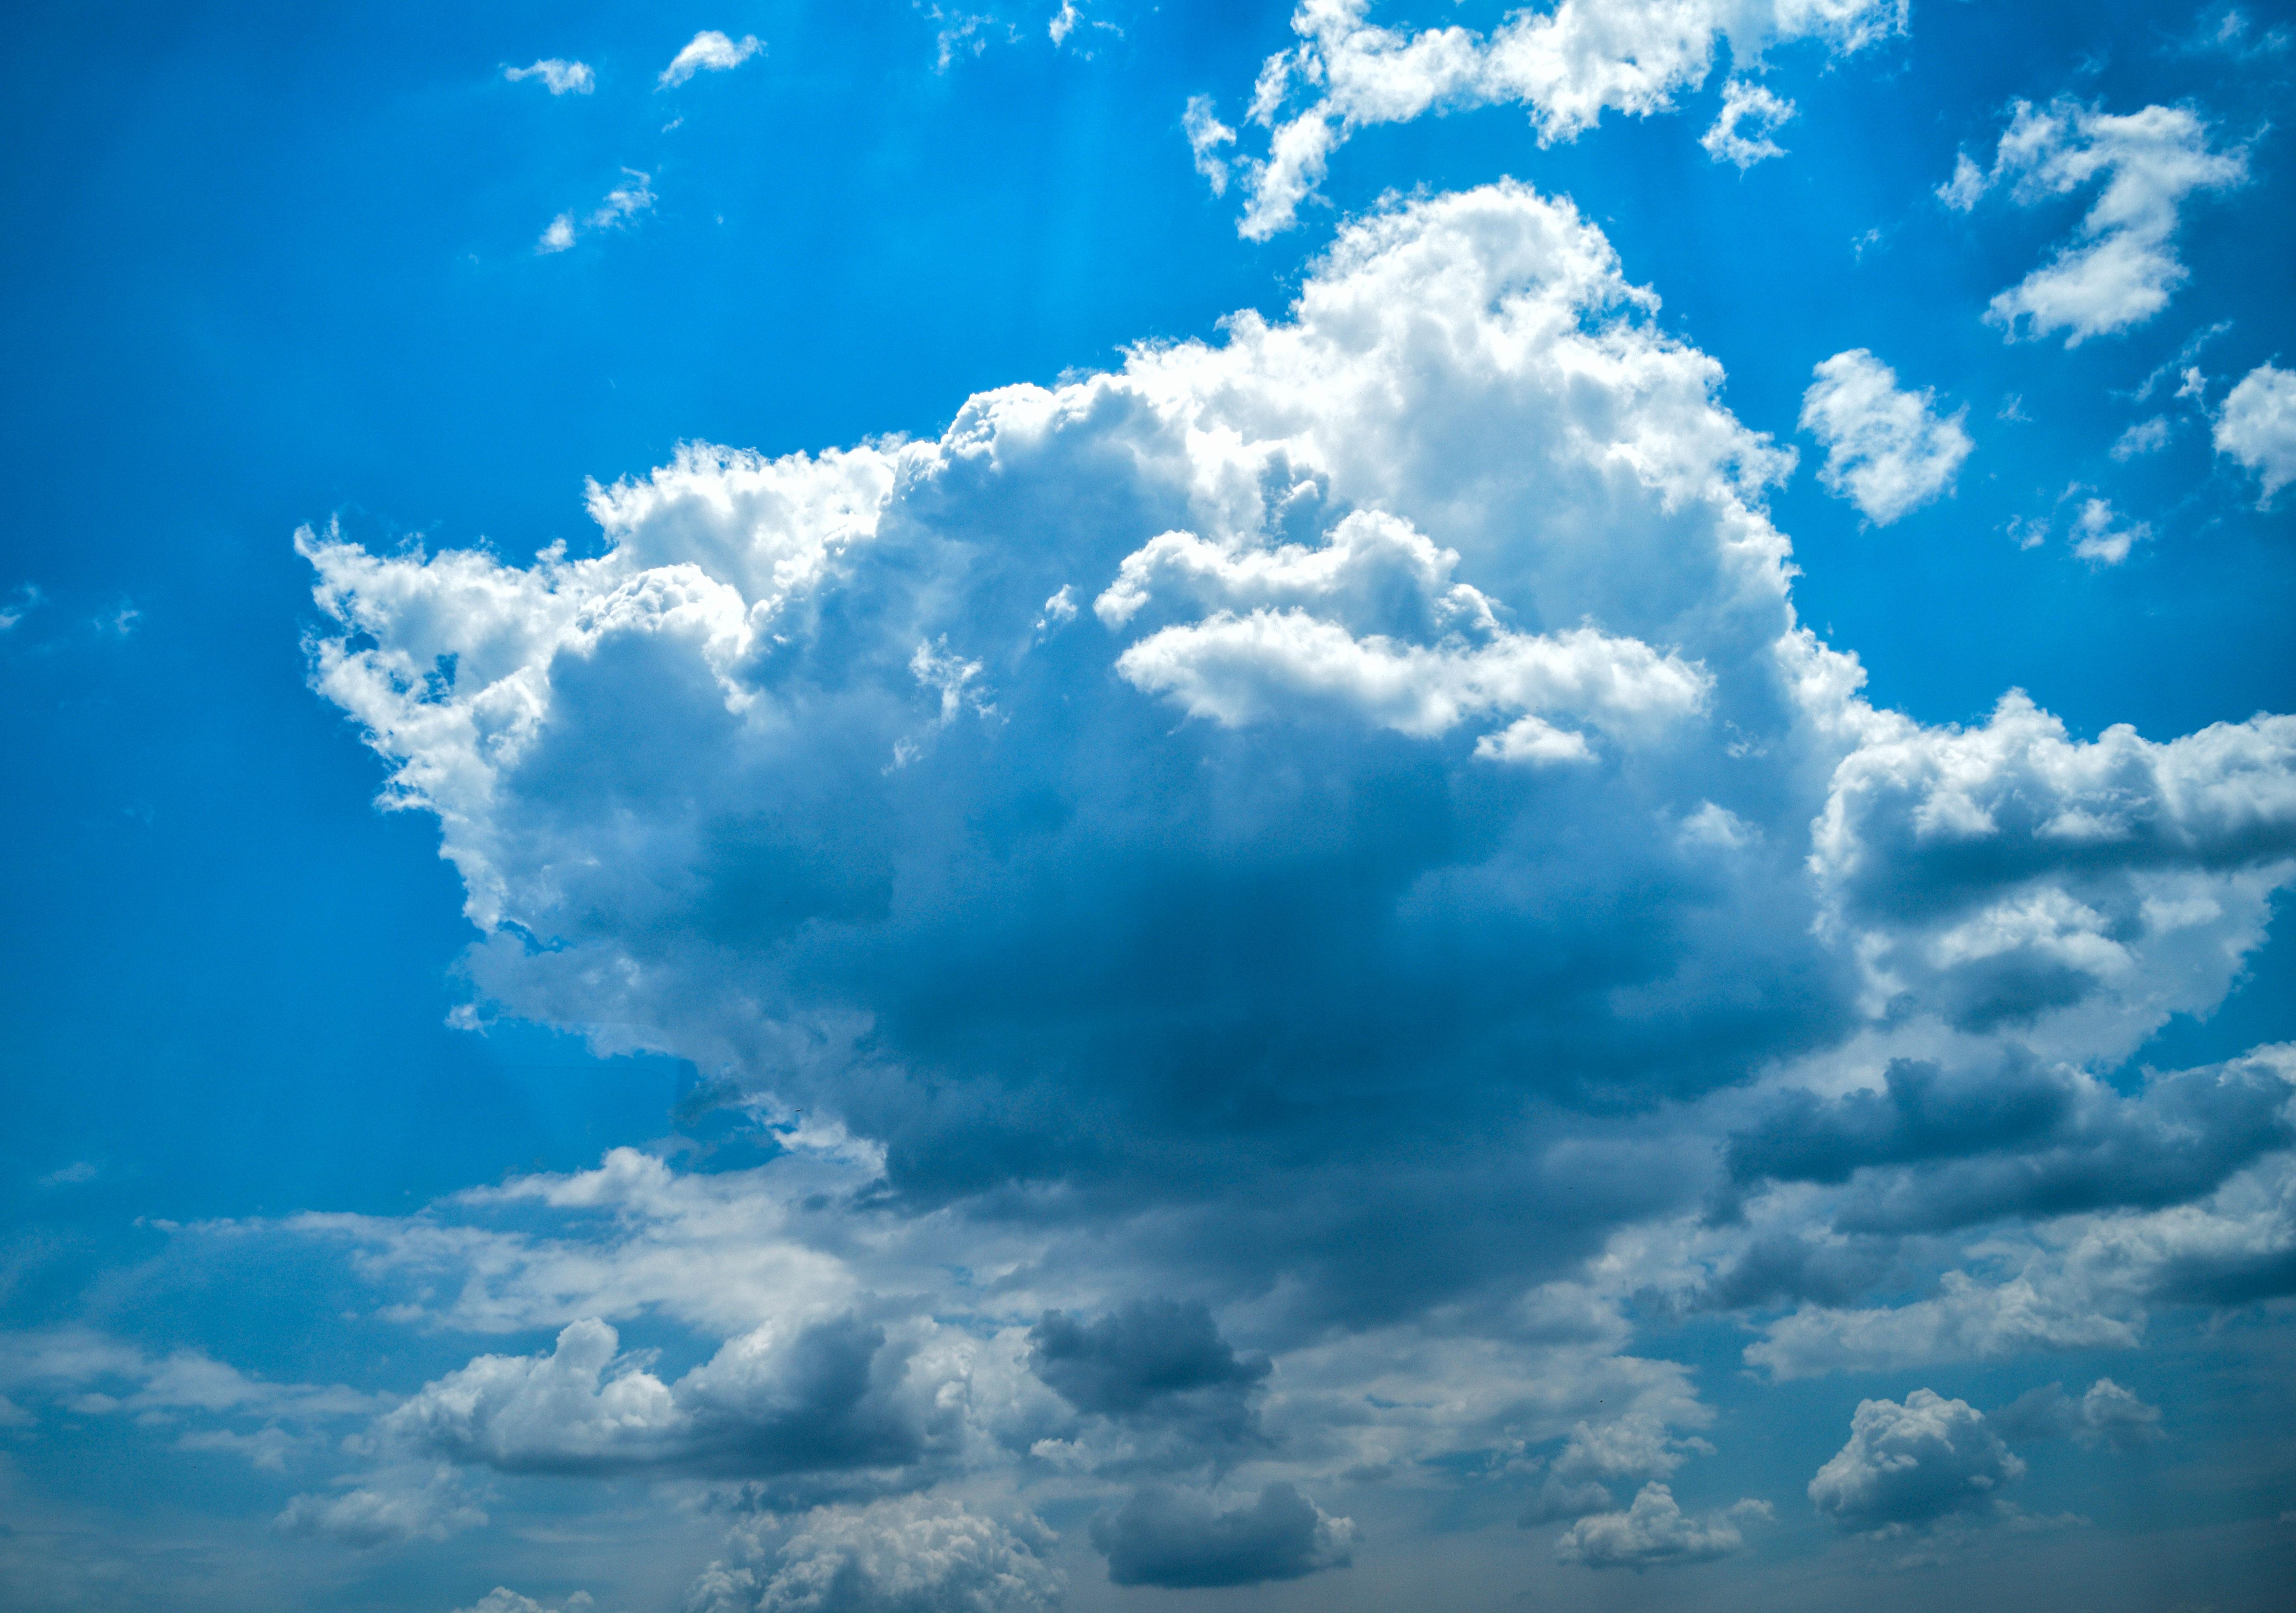 Samsung Galaxy Note 5 Hd Wallpaper: 1440x2960 Clouds Summer Weather 5k Samsung Galaxy Note 9,8